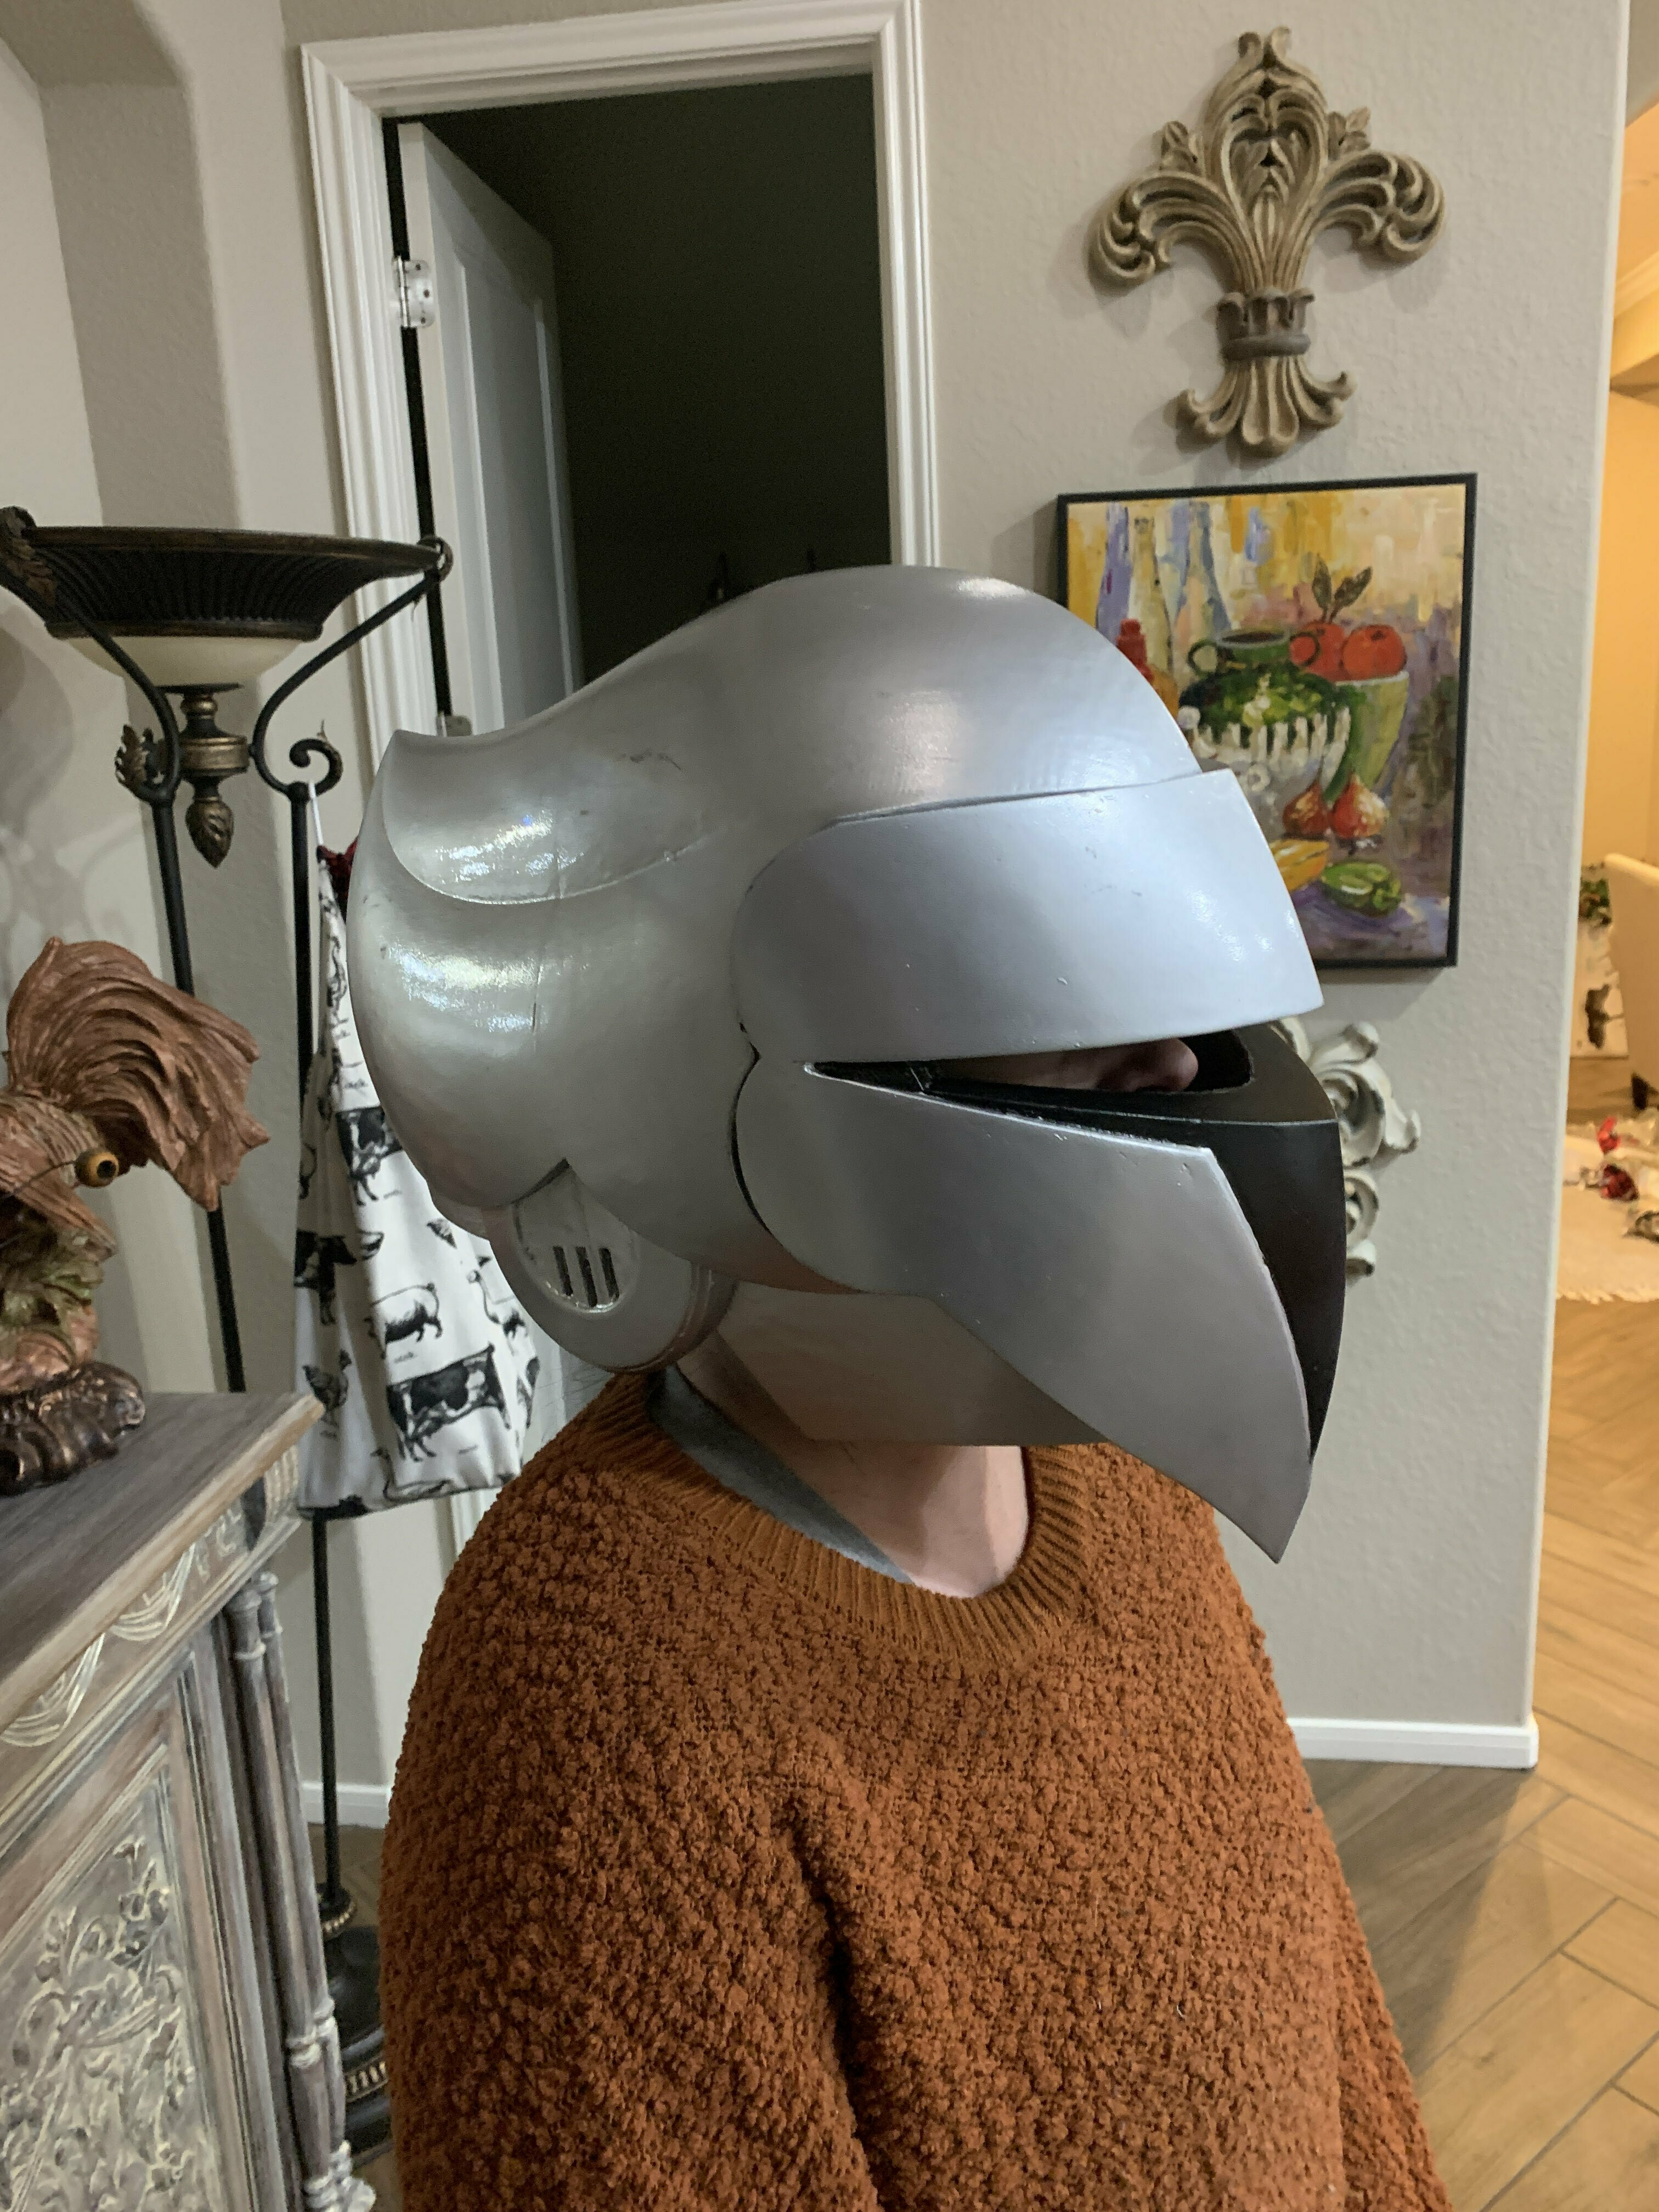 Download STL file Silverhawks helmet with Stand • 3D printer object, bobdole122333